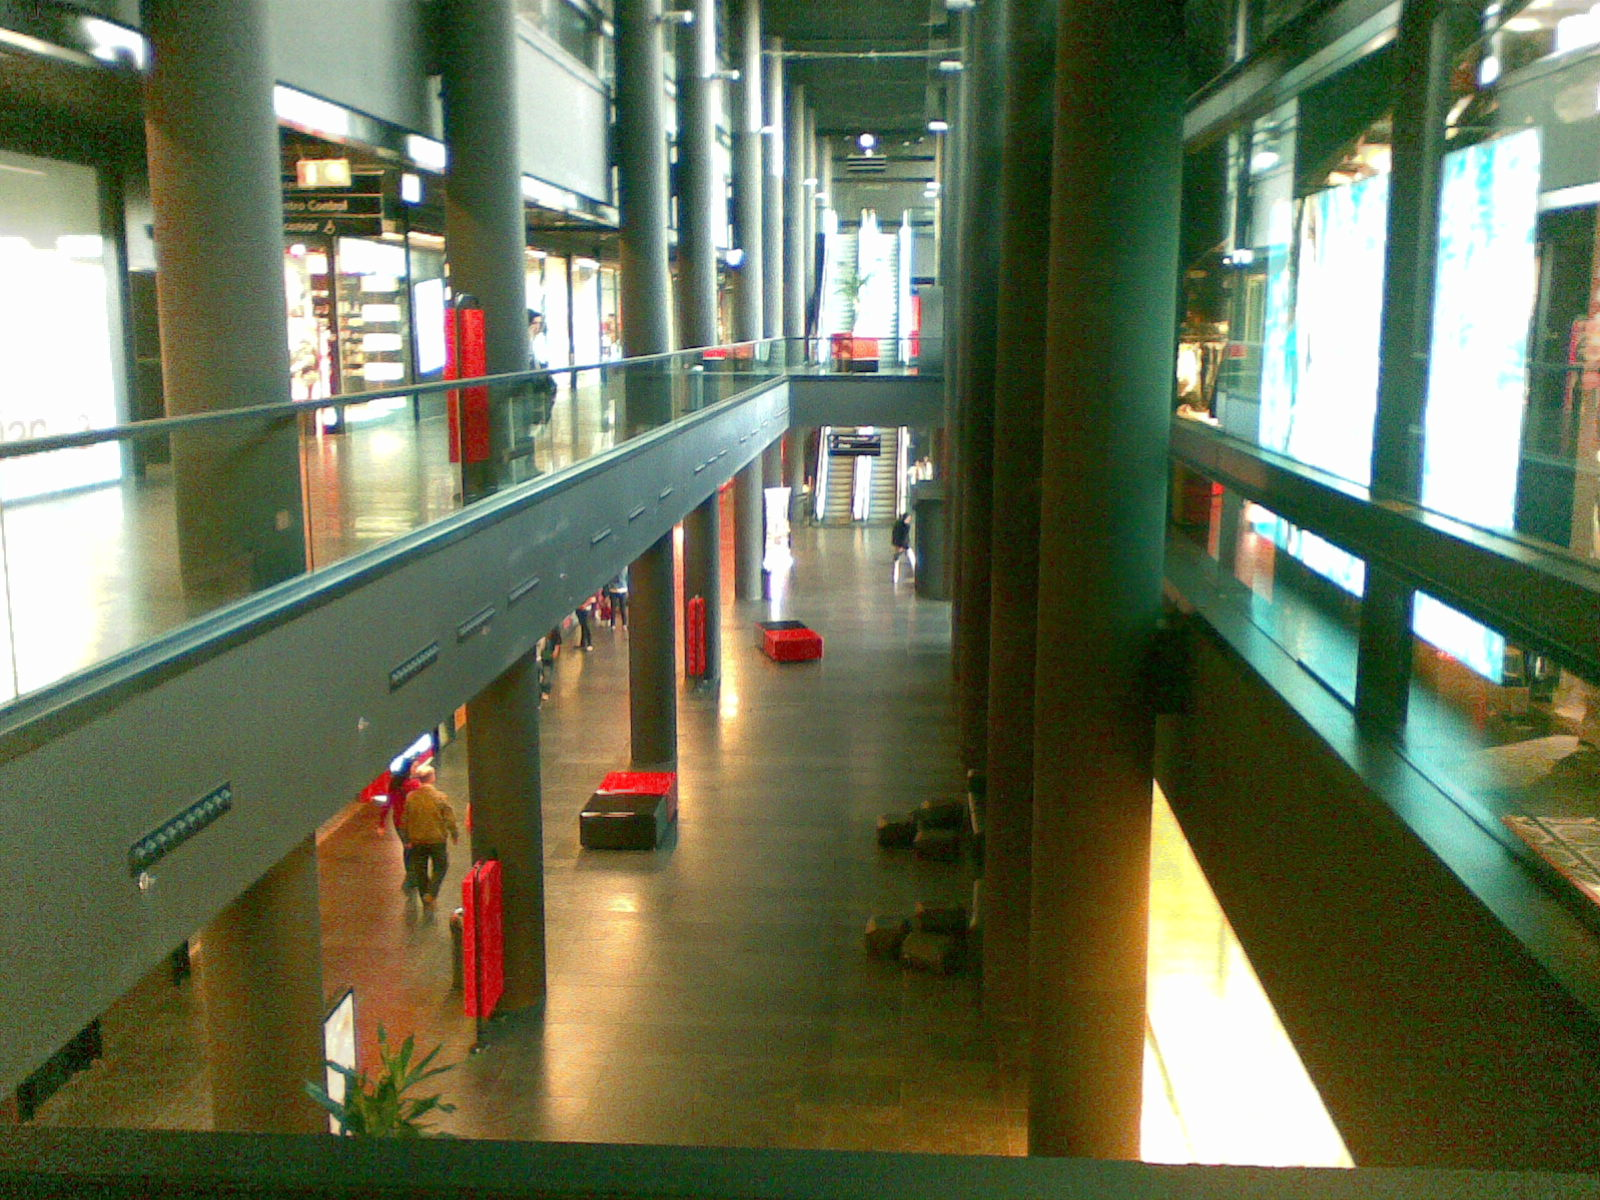 Comerciales En Centros Comerciales Comerciales Vigo En Centros Vigo Centros fxaEOqY